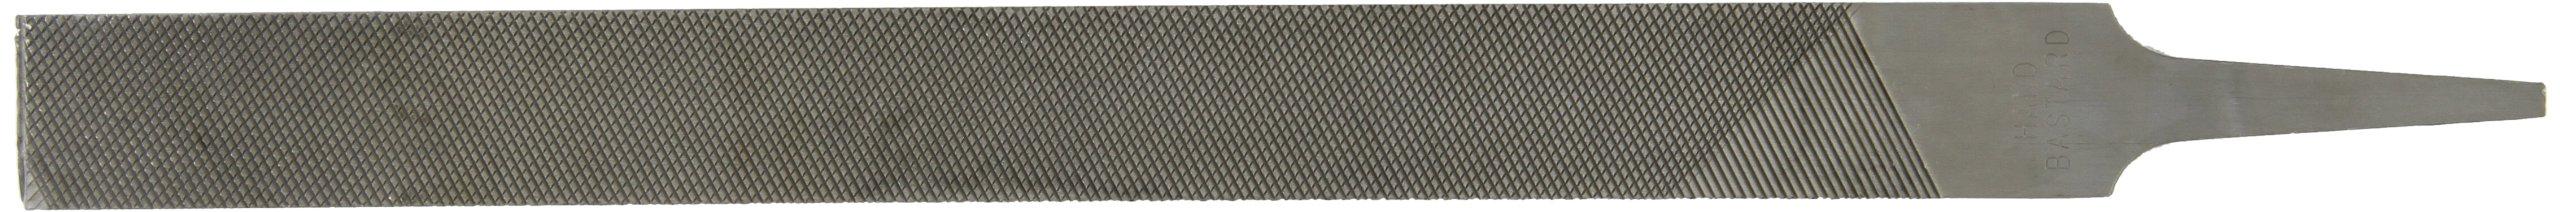 Nicholson Hand File, American Pattern, Double Cut, Rectangular, Coarse, 12'' Length